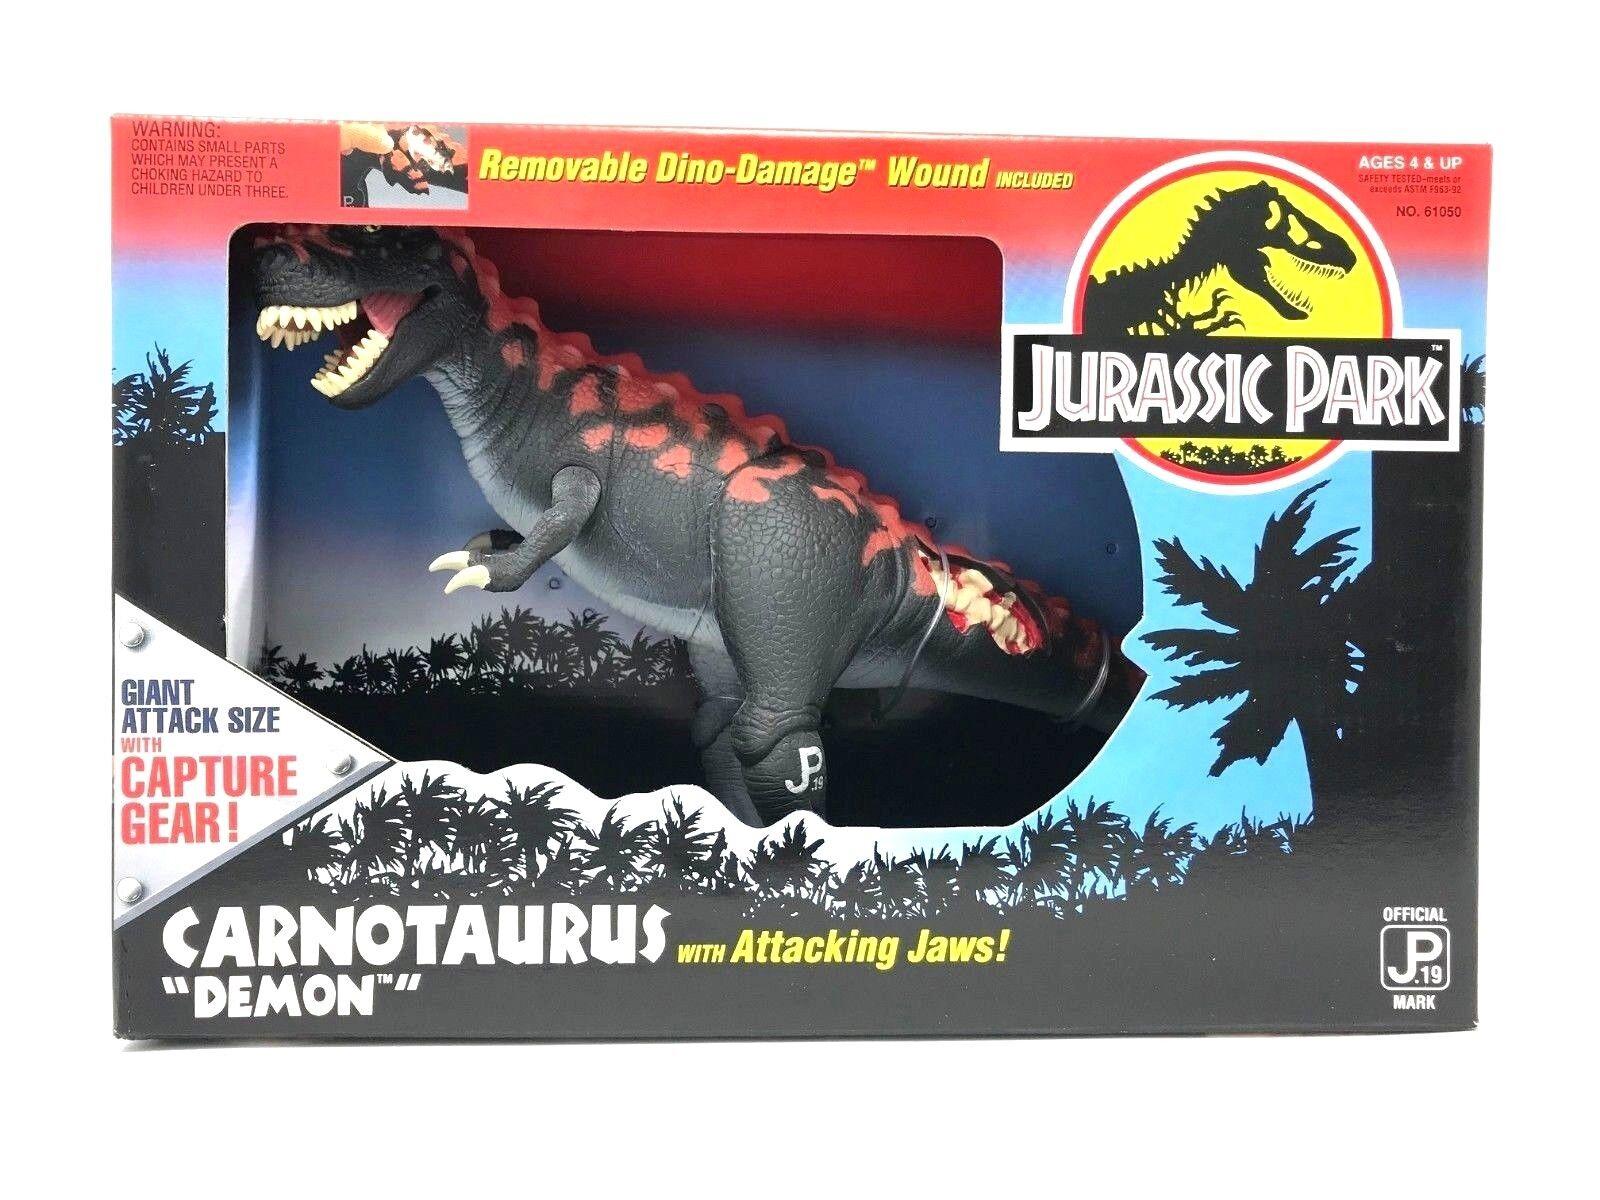 1994 Kenner Jurassic Park Series 2 Carnotaurus Demon New MIB Dinosaur Toy Figure